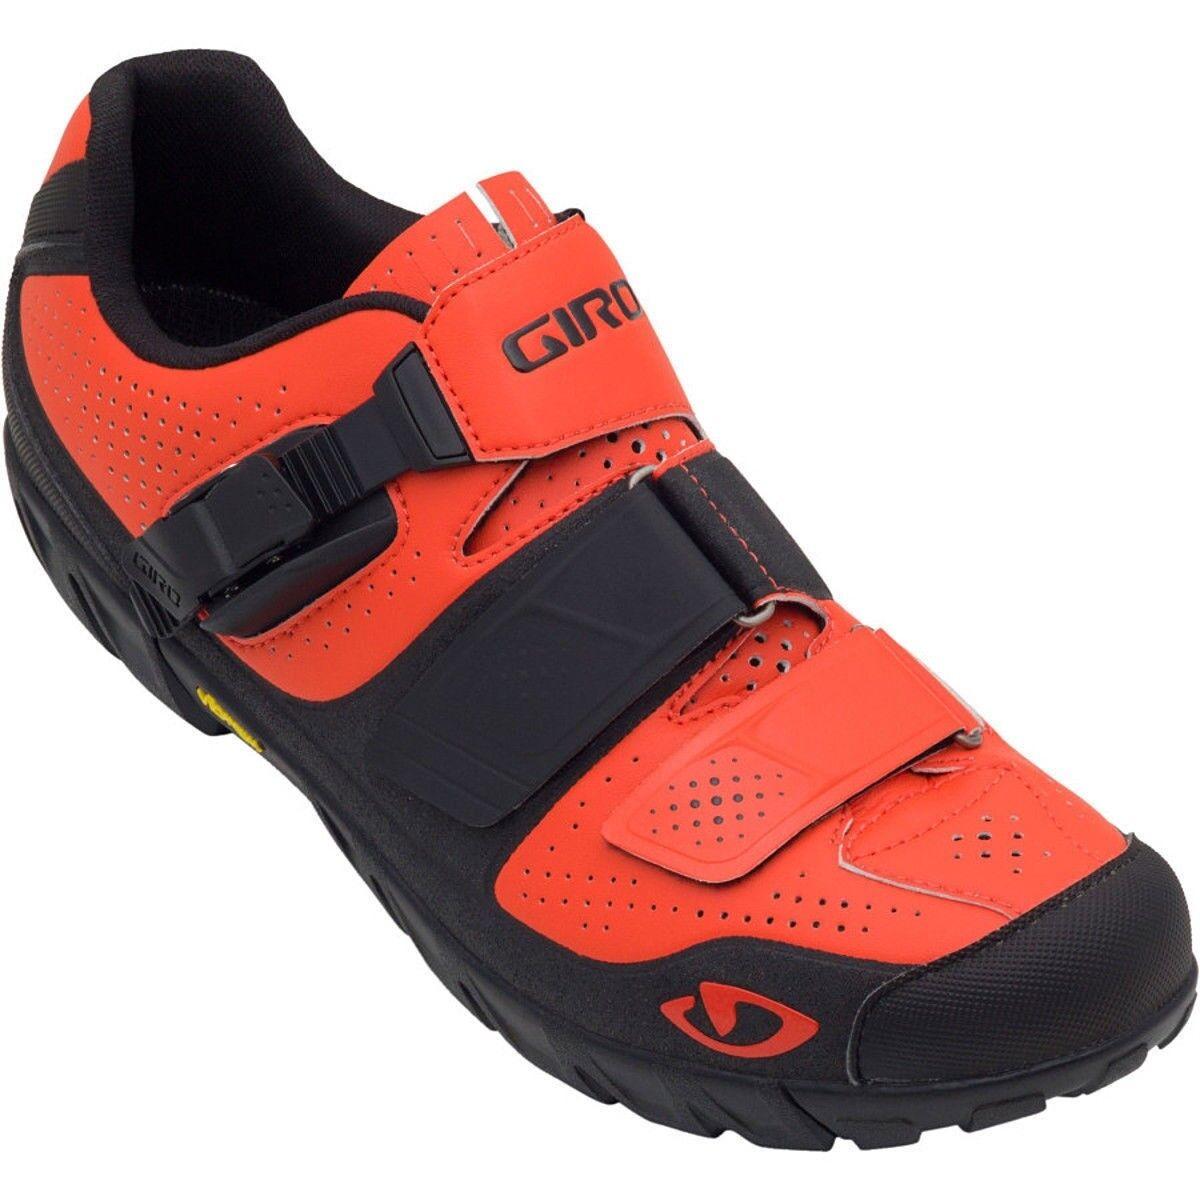 New GIRO Terraduro Cycling shoes Red